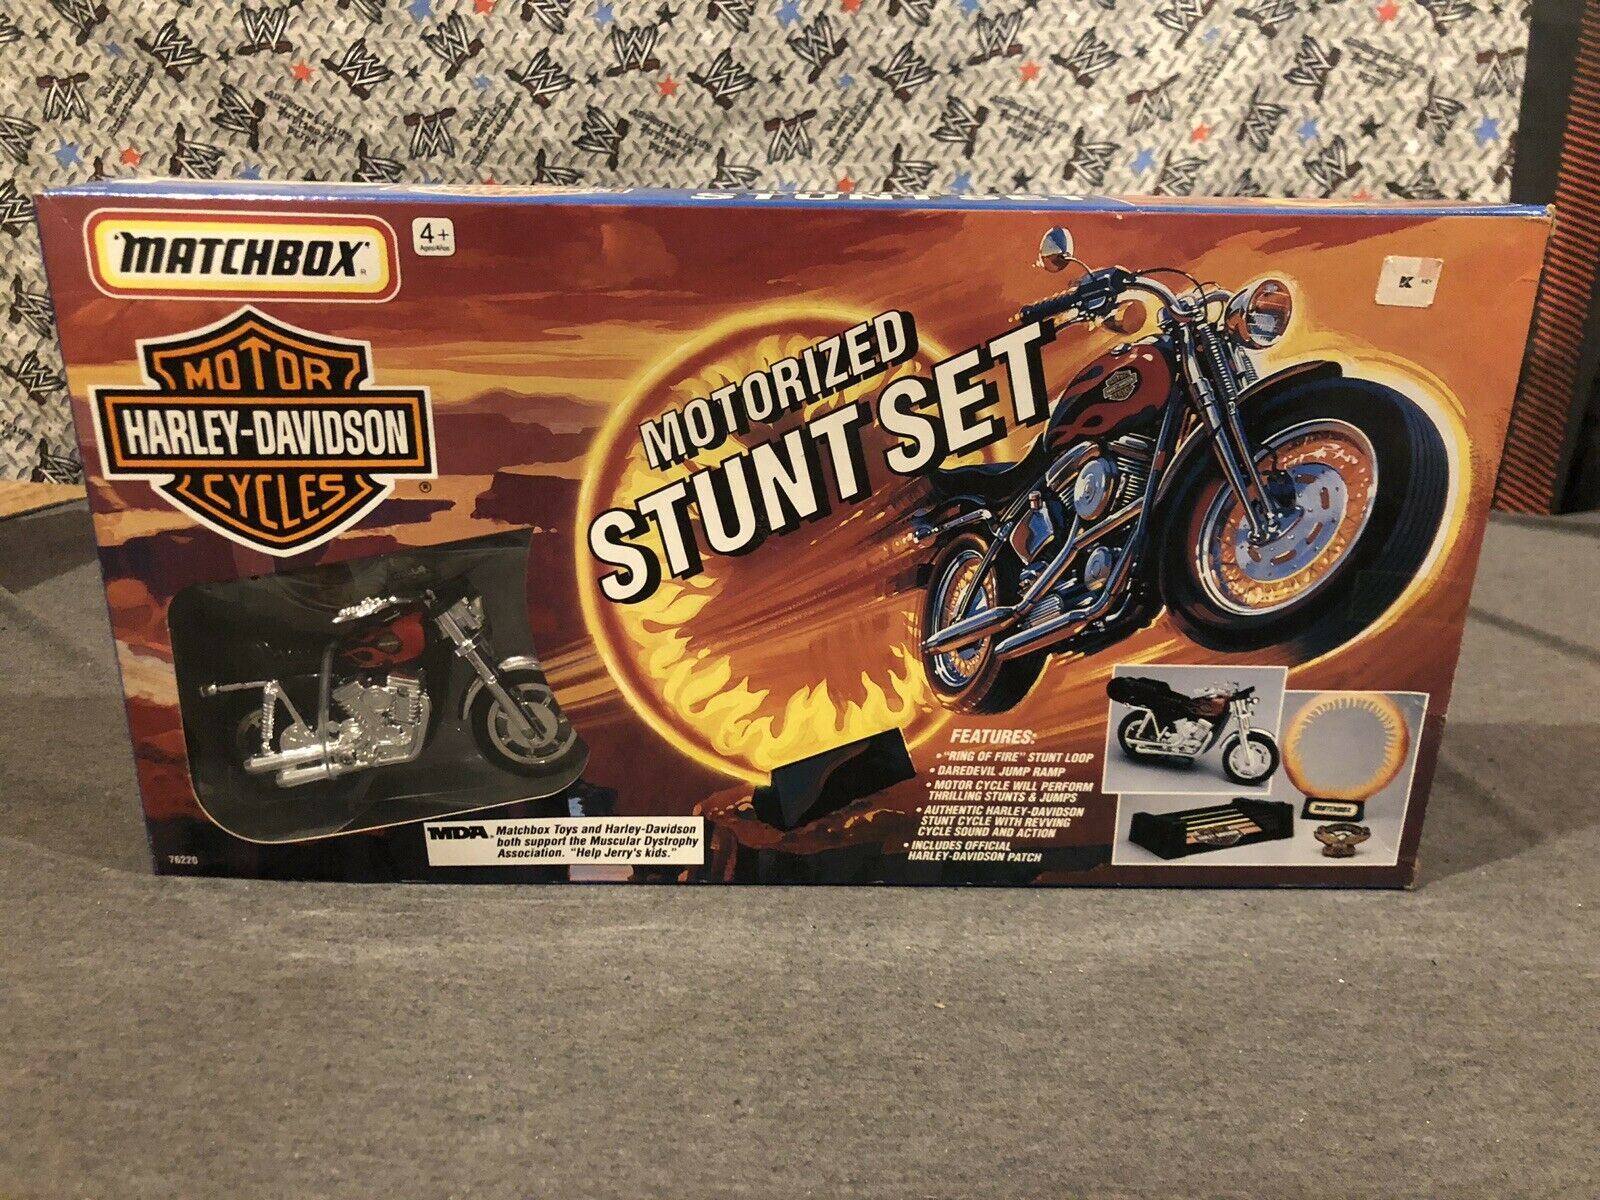 Matchbox Harley-Davidson motoriserat stunt Set Ring of Fire Motorcycle Eagle Patch